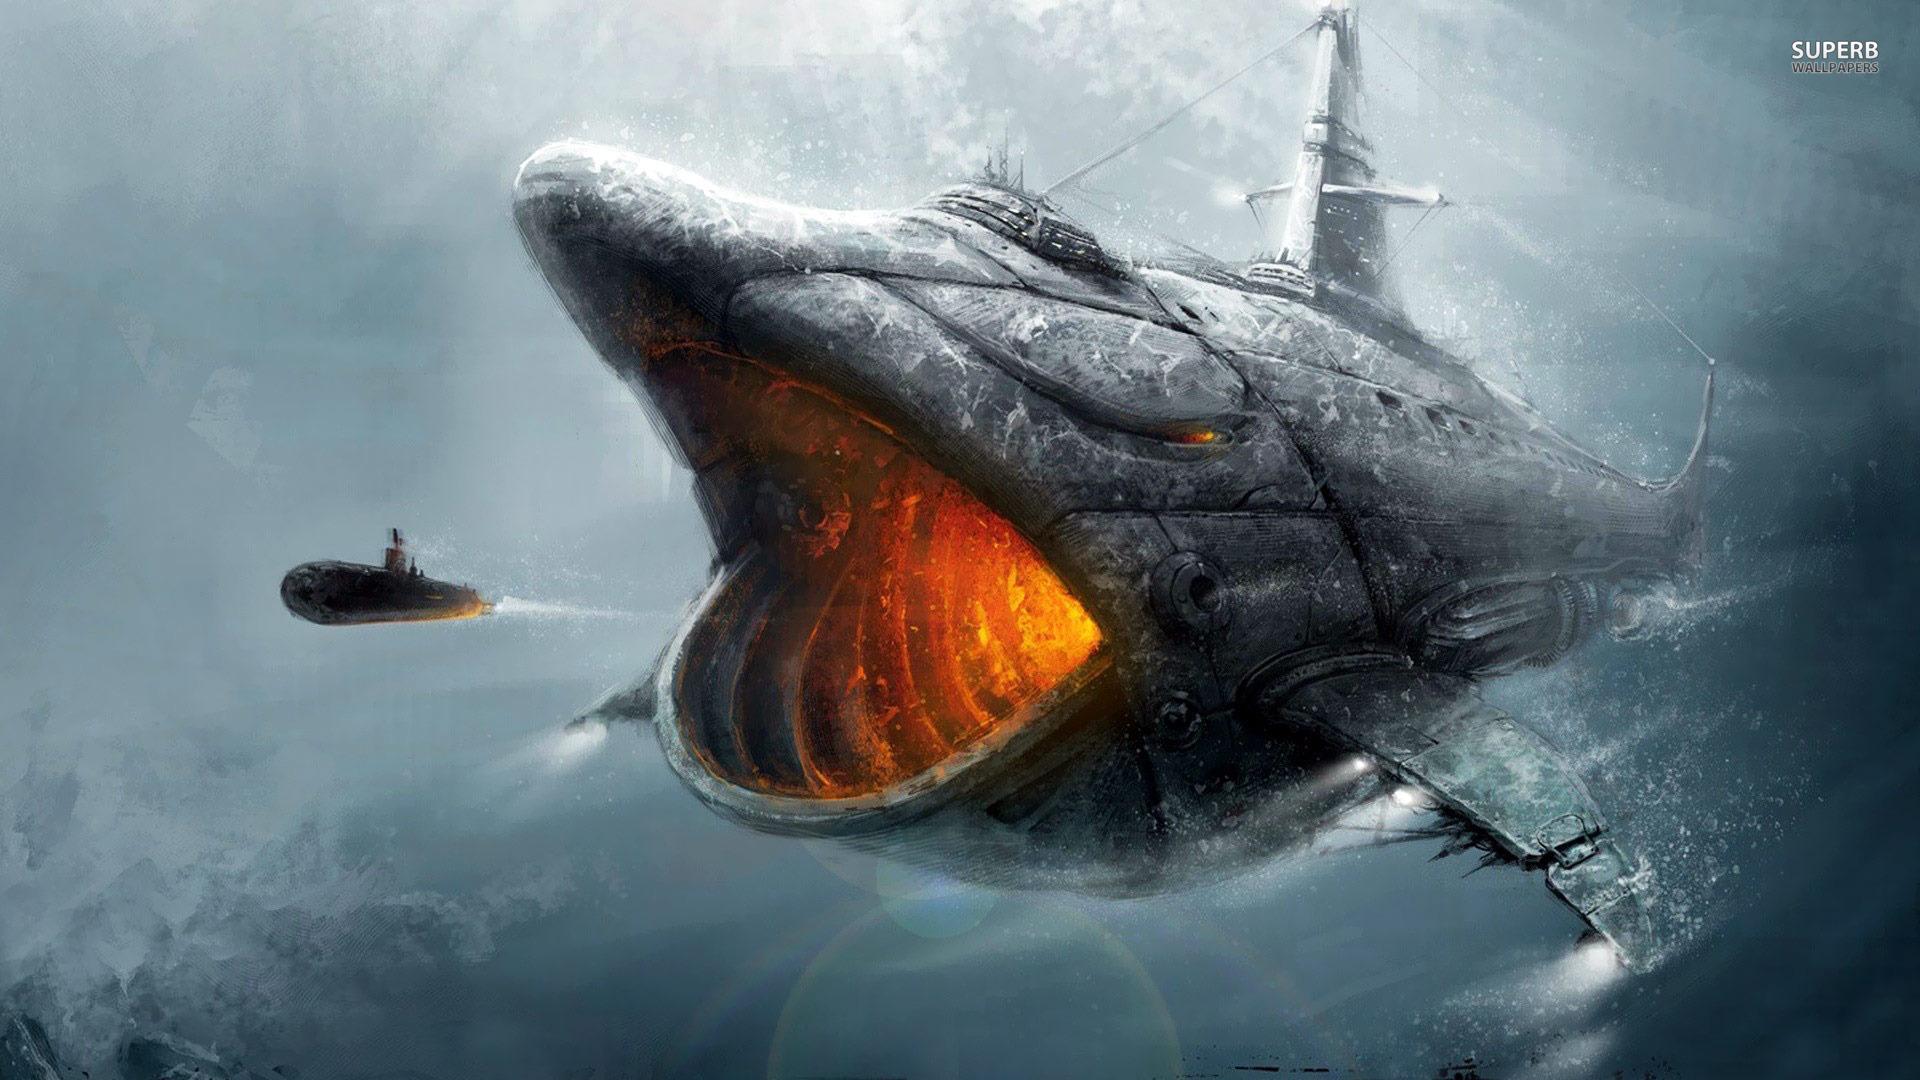 Shark submarine wallpaper 1920x1080 jpg